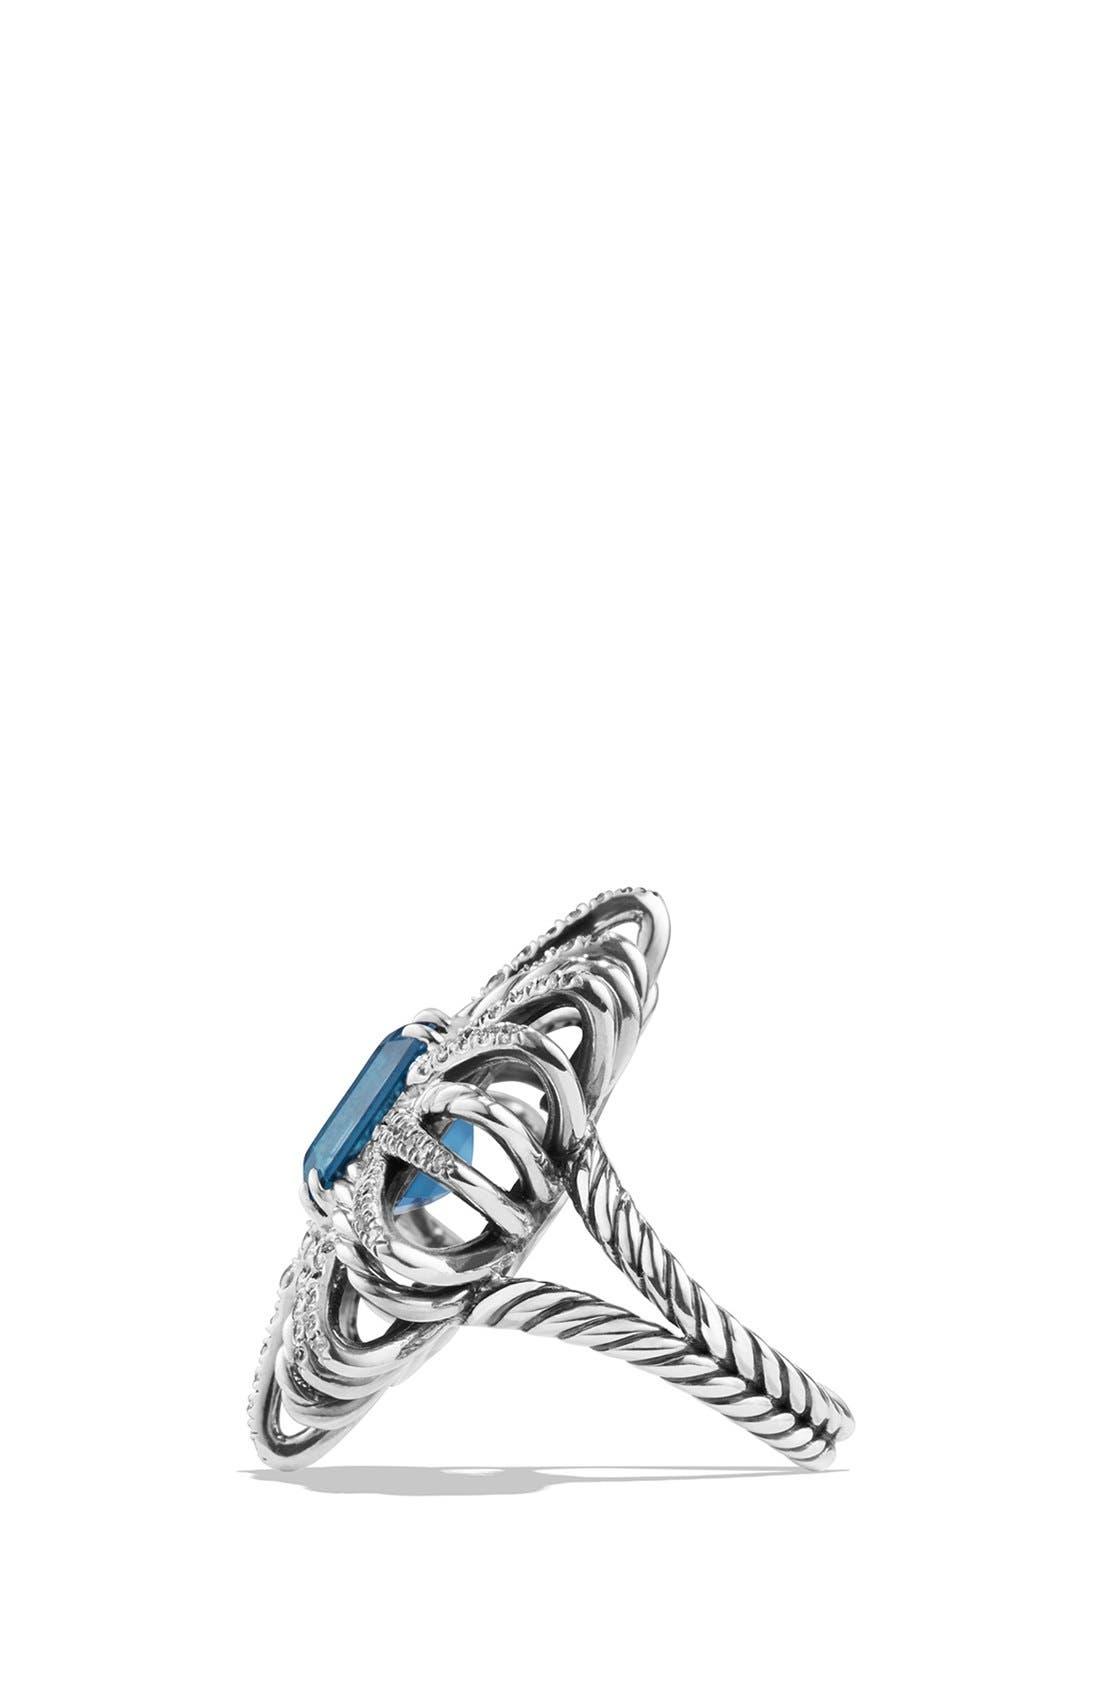 'Starburst' Ring with Semiprecious Stone and Diamonds,                             Alternate thumbnail 3, color,                             Hampton Blue Topaz